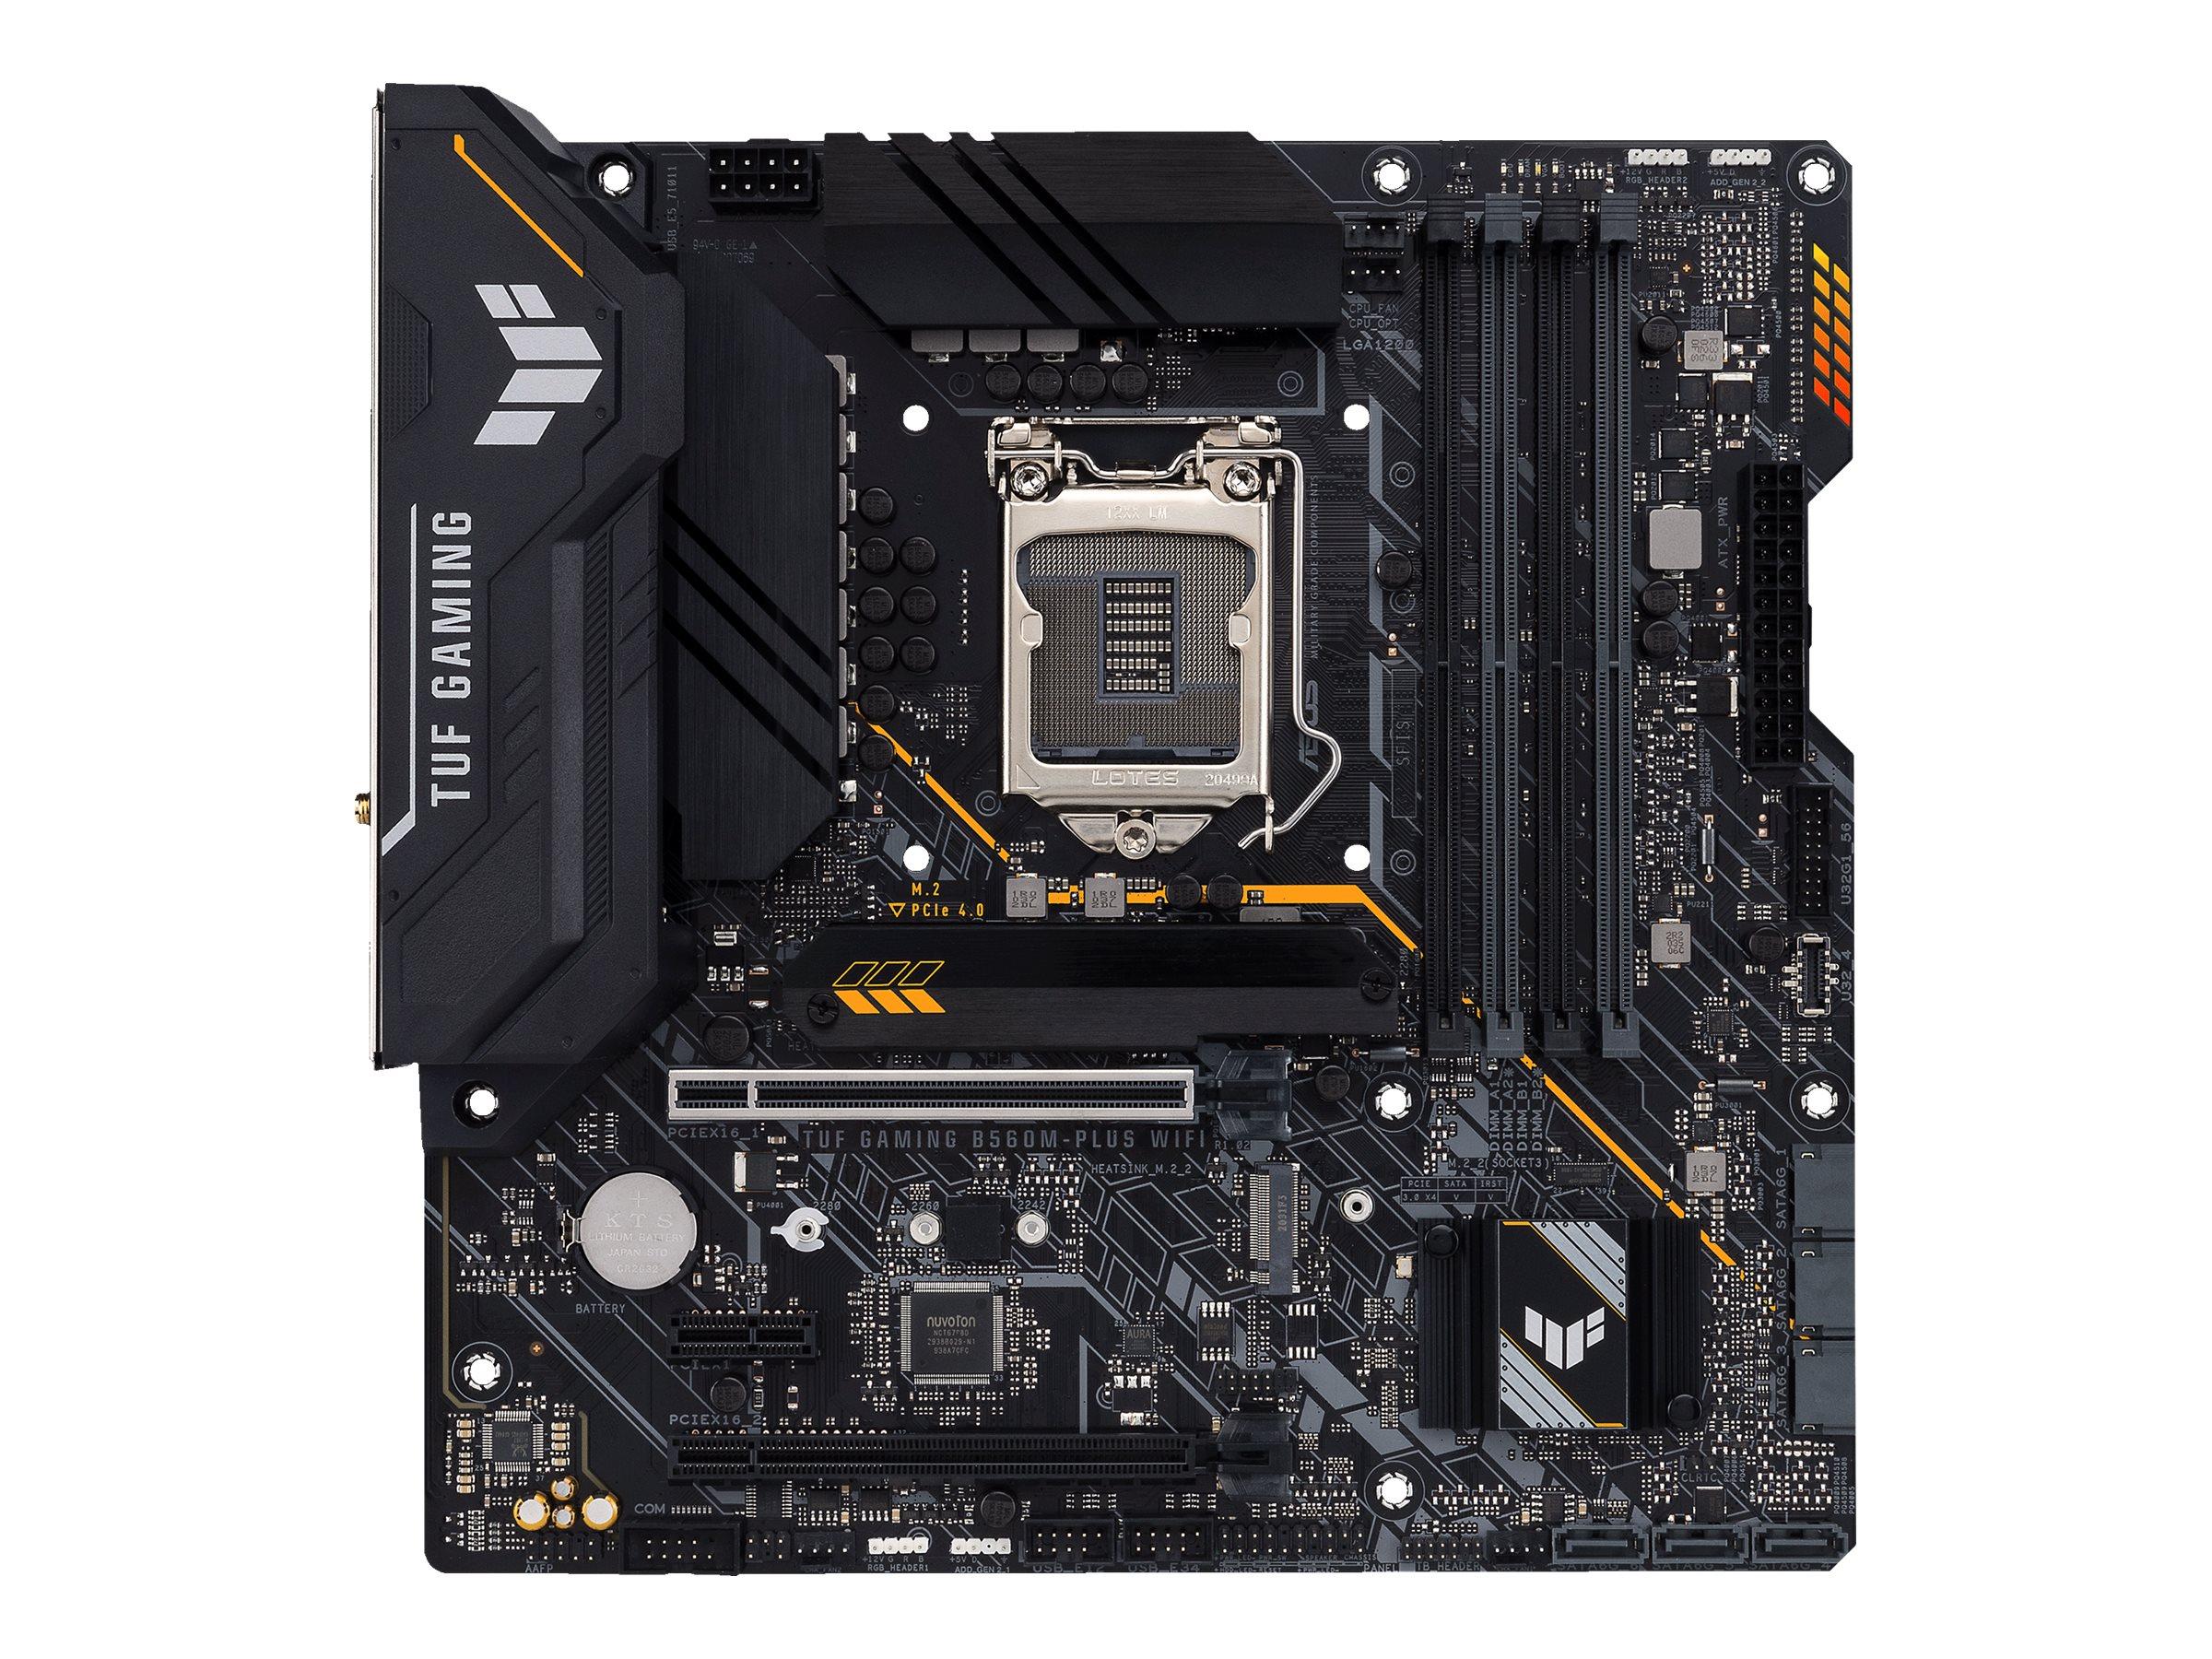 Vorschau: ASUS TUF GAMING B560M-PLUS WIFI - Motherboard - micro ATX - LGA1200-Sockel - B560 - USB-C Gen1, USB 3.2 Gen 1, USB 3.2 Gen 2 - 2.5 Gigabit LAN, Wi-Fi, Bluetooth - Onboard-Grafik (CPU erforderlich)